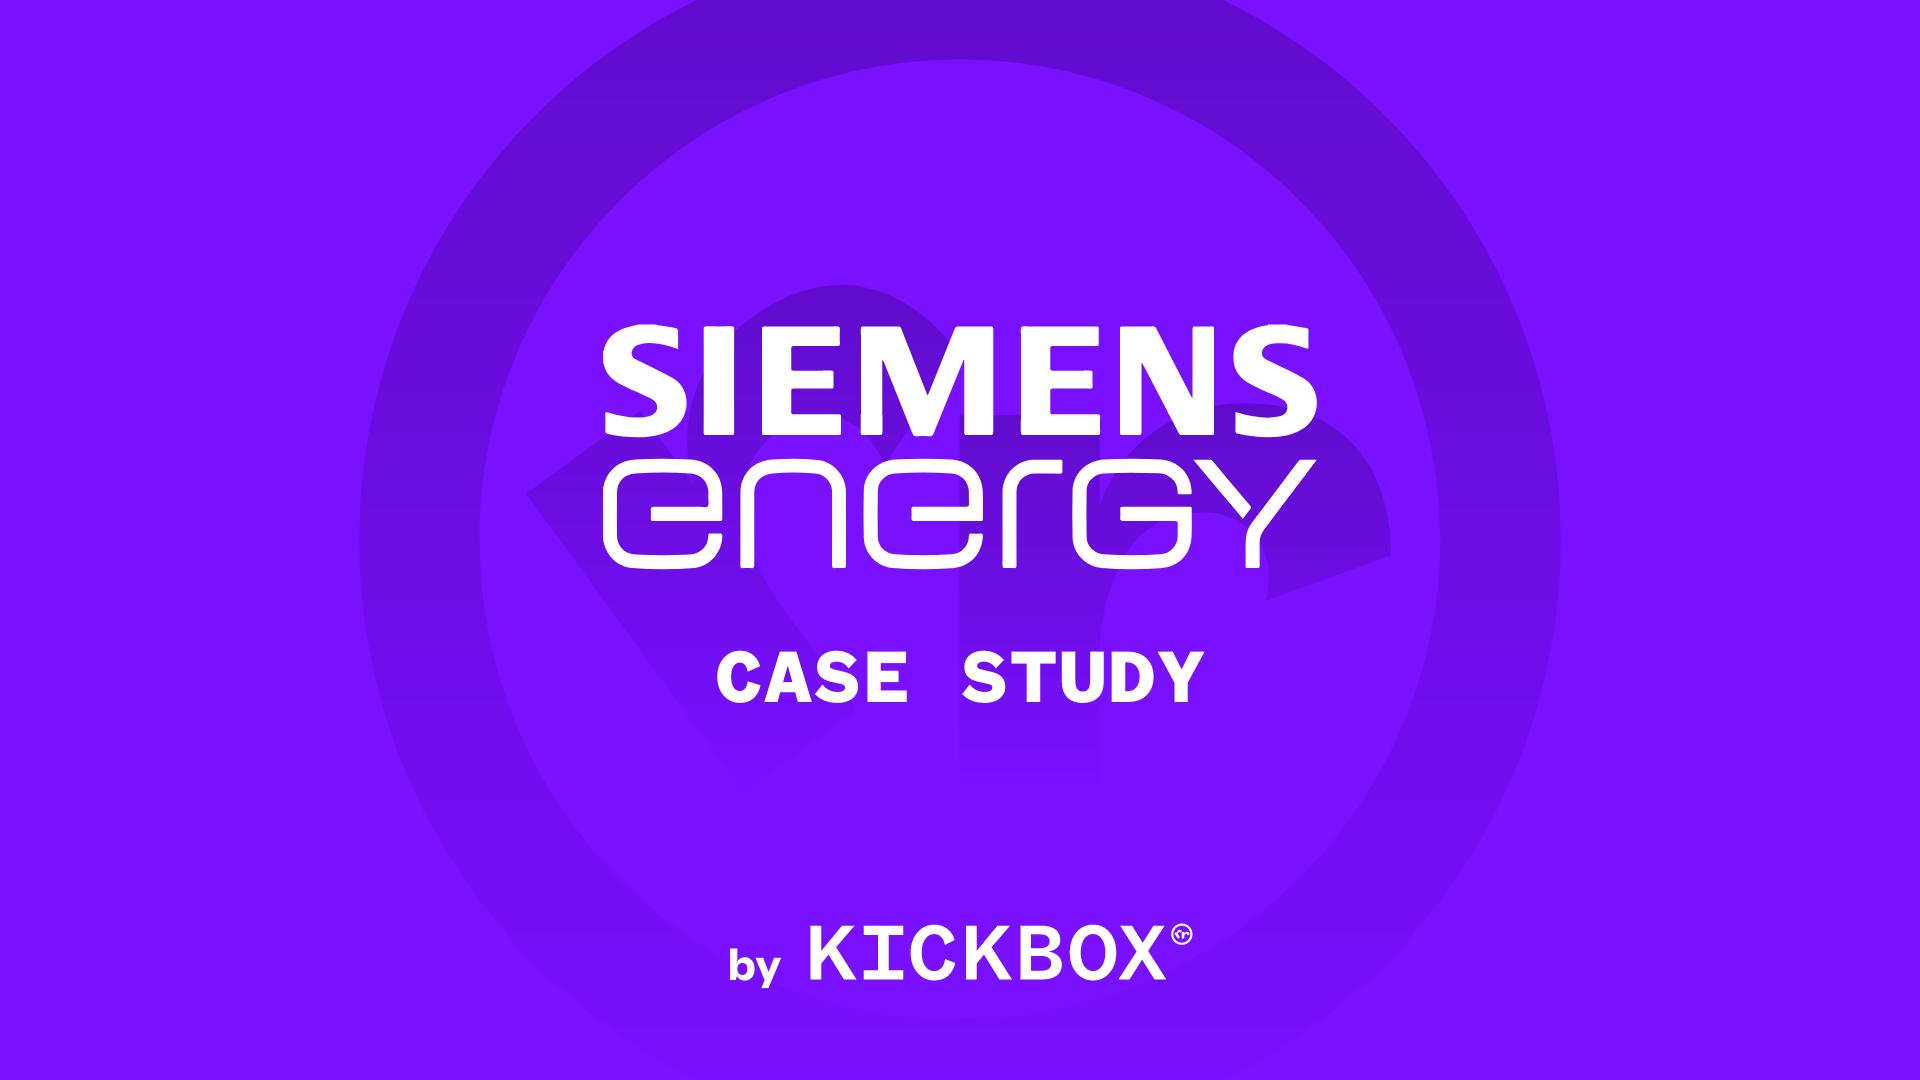 rready_Case_Study_Siemens_Outro_Ralph_FINAL